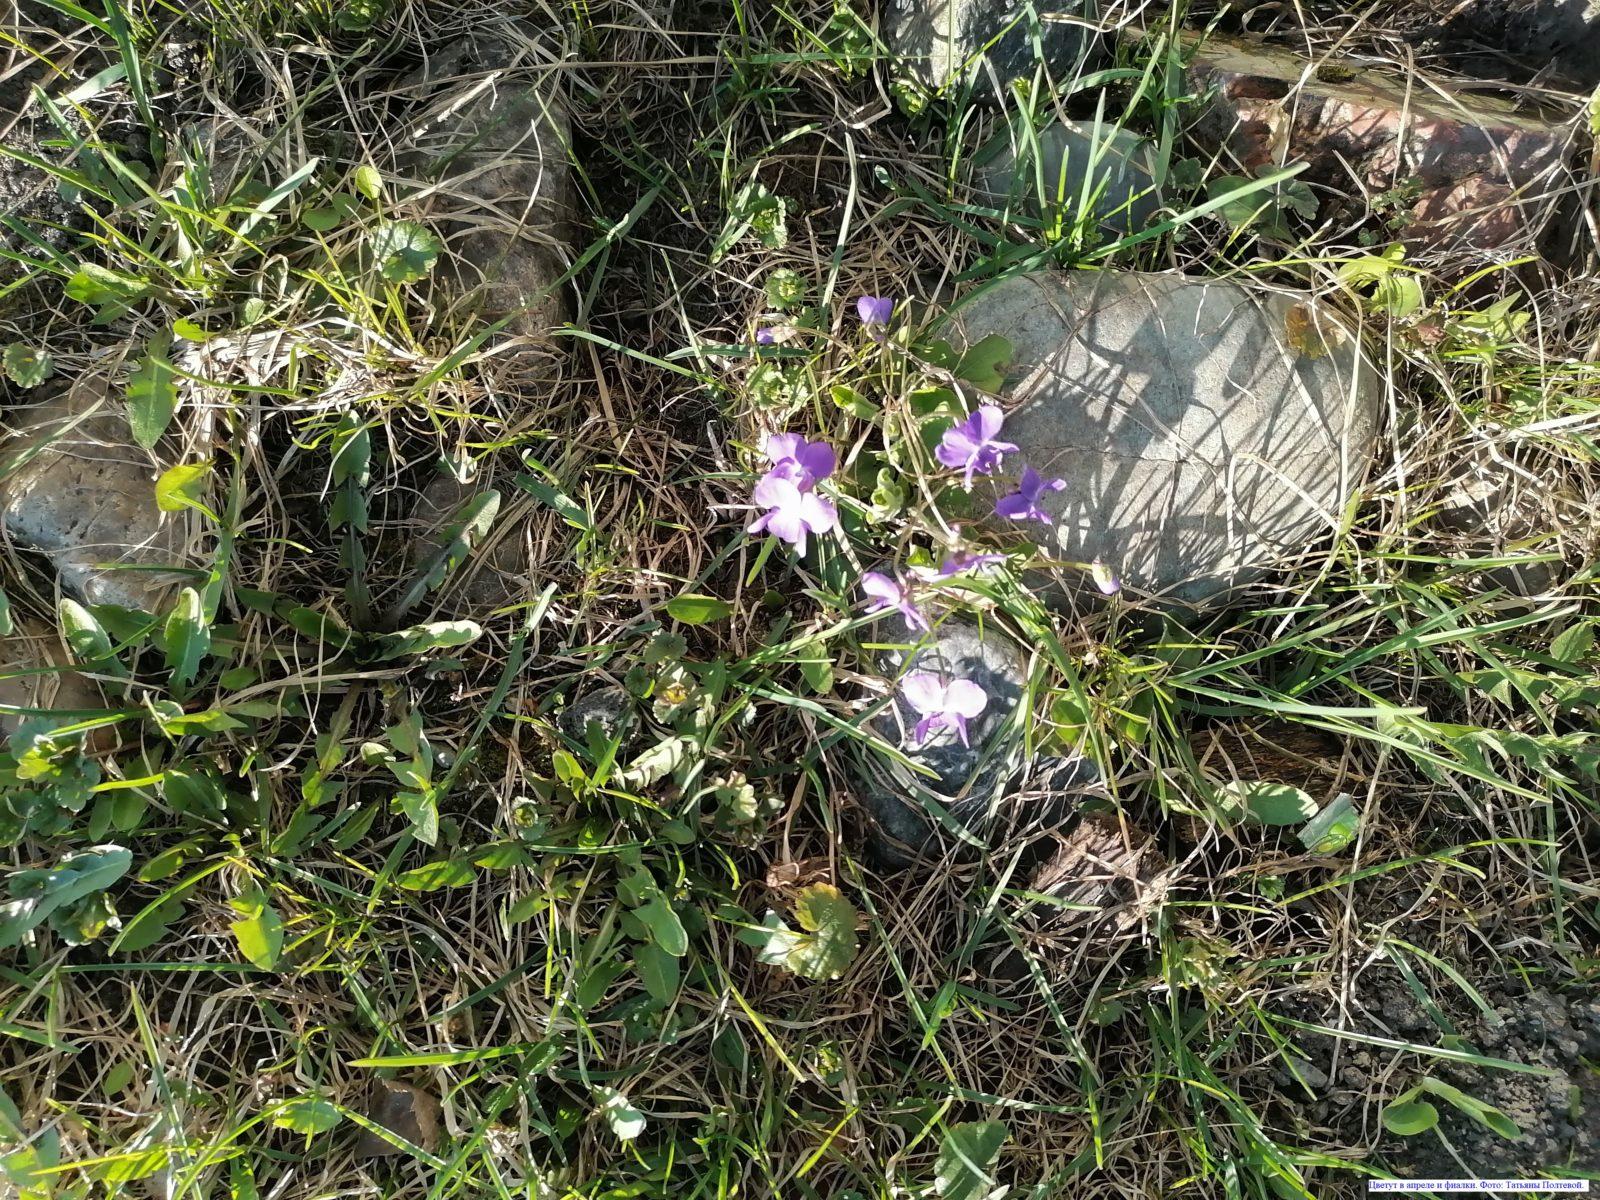 Цветут в апреле и фиалки.